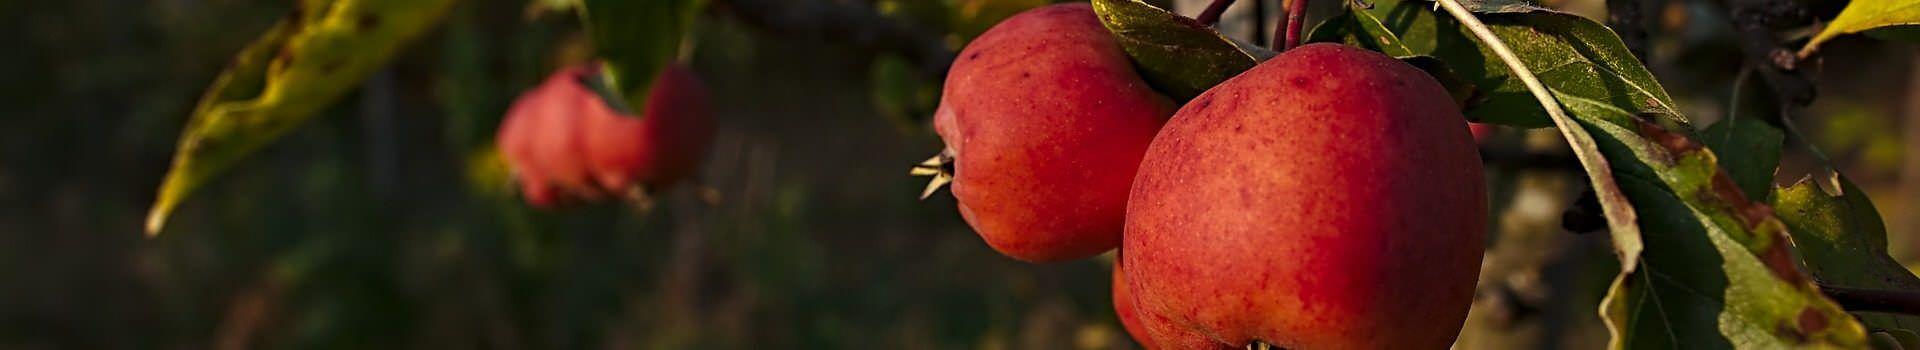 apple-3924150_1920